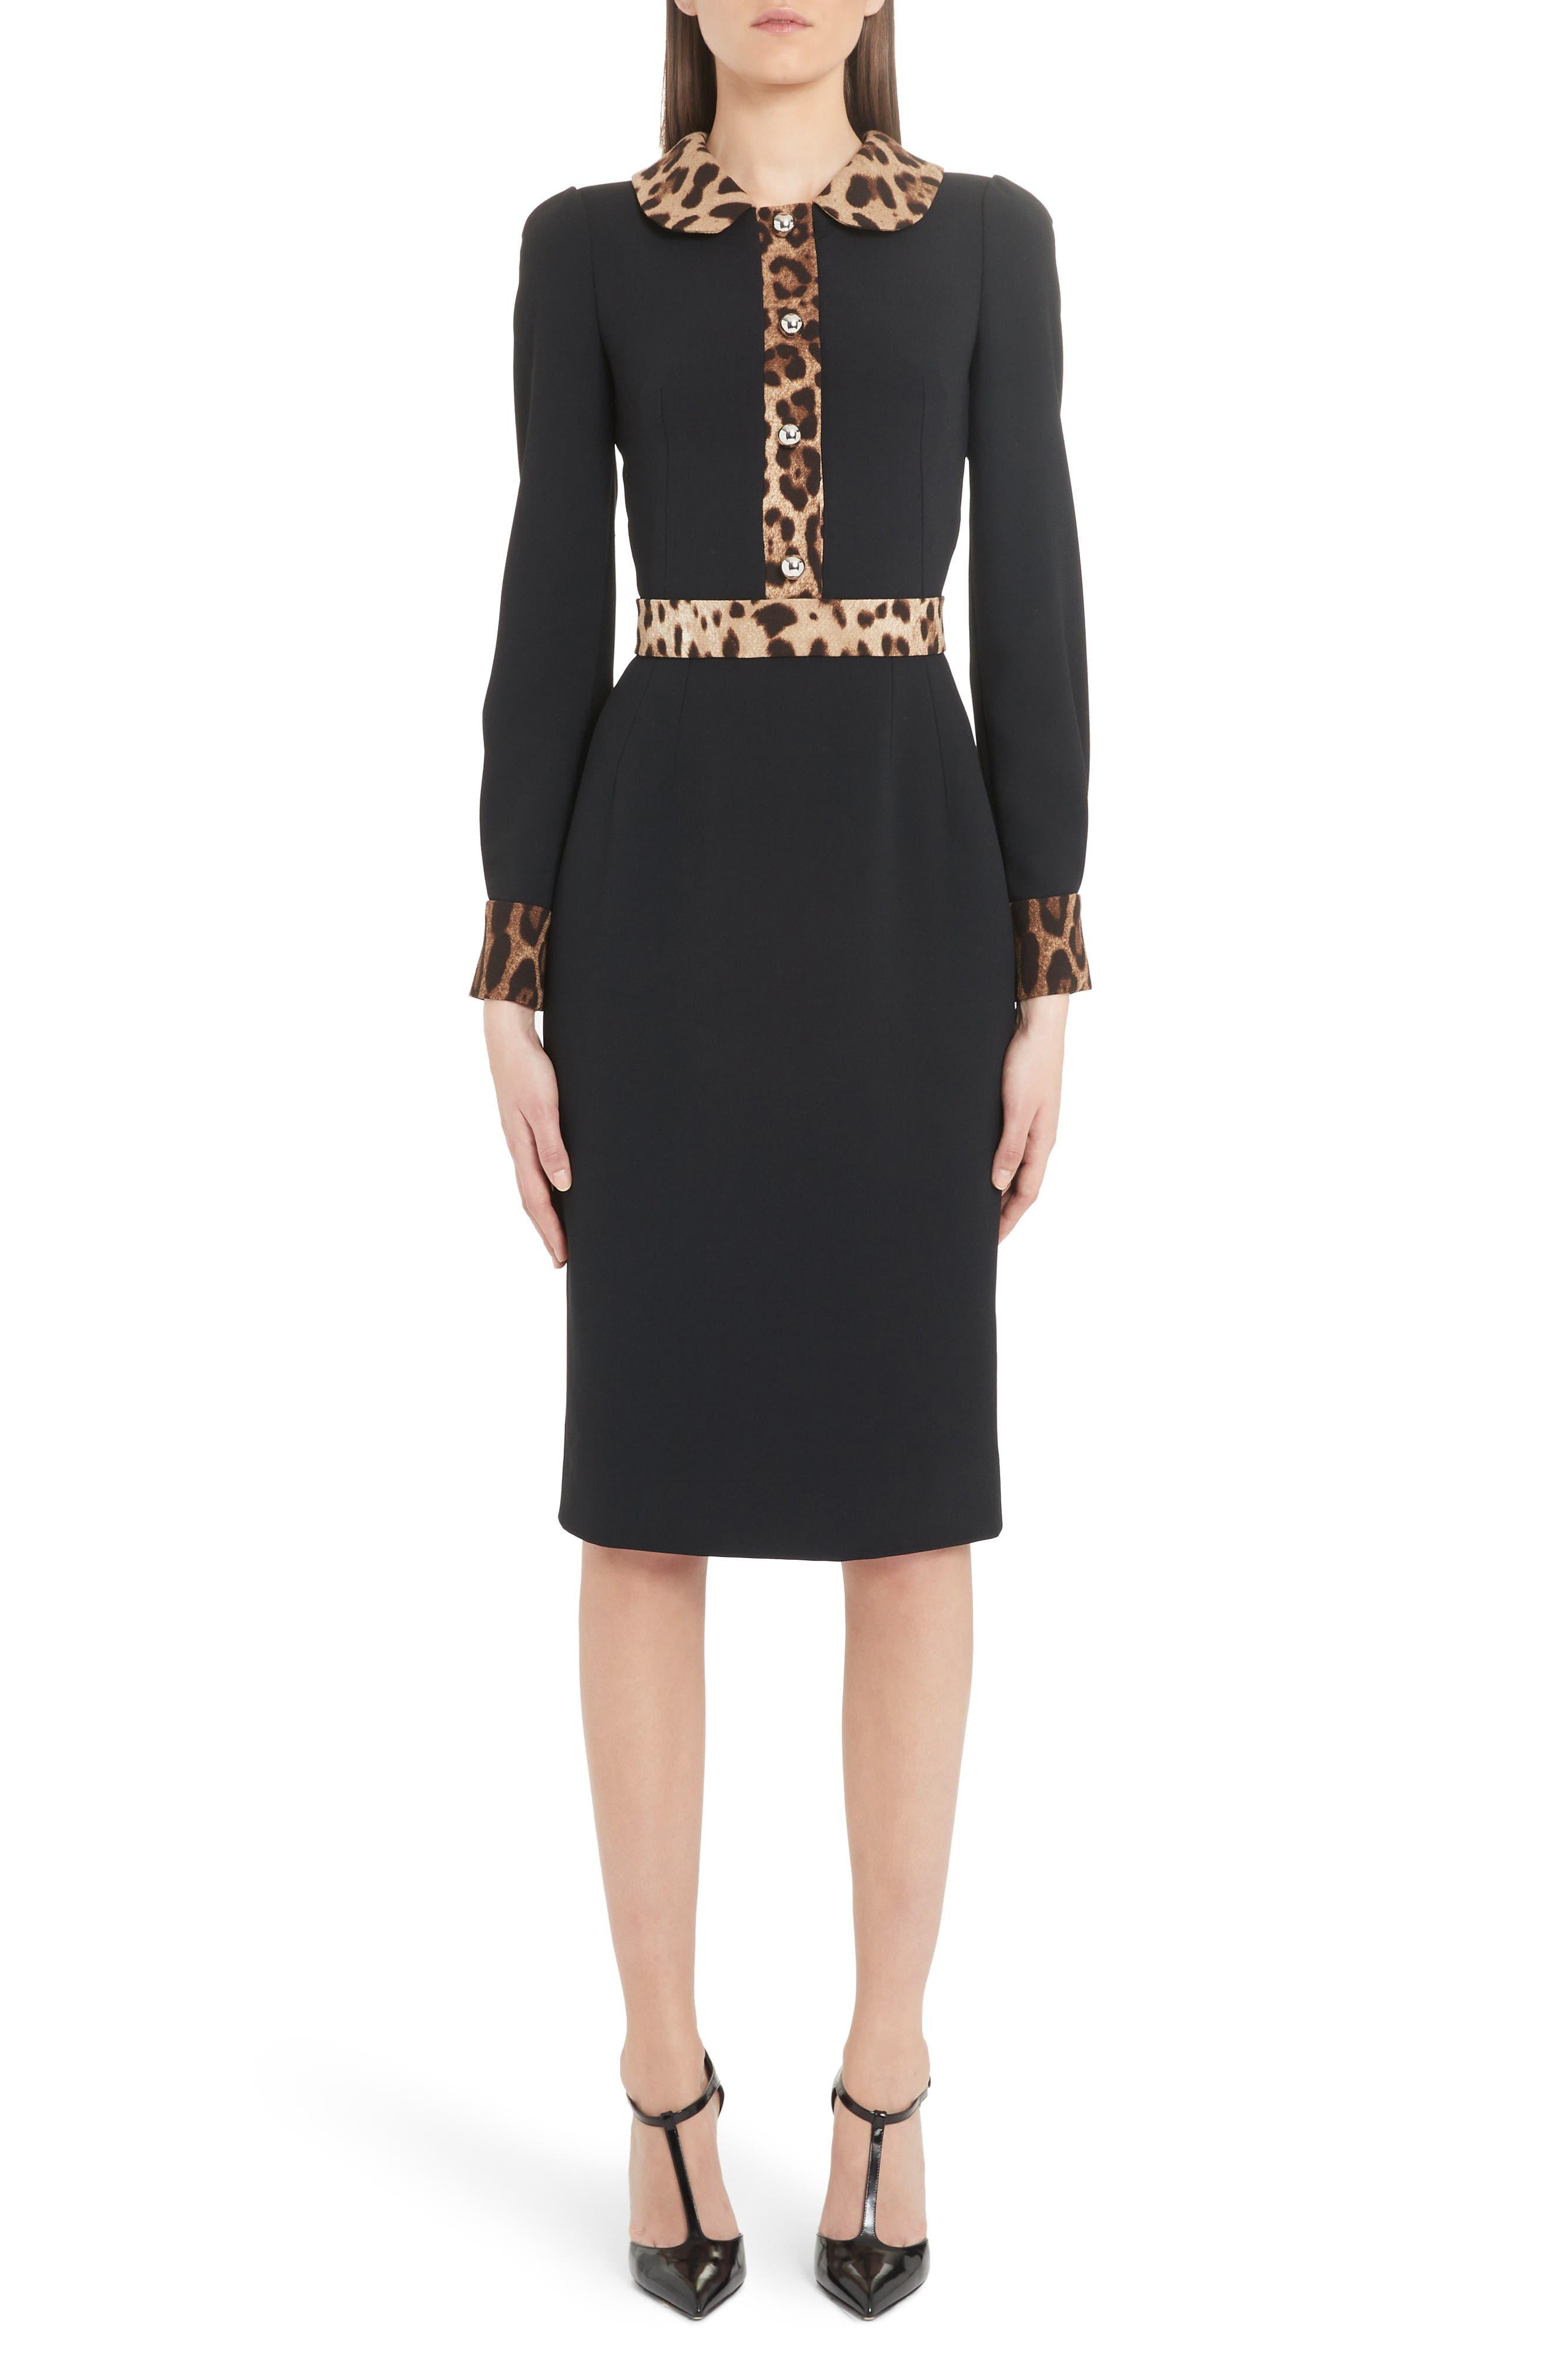 Dolce & gabbana Leopard Trim Long Sleeve Sheath Dress, US / 40 IT - Black